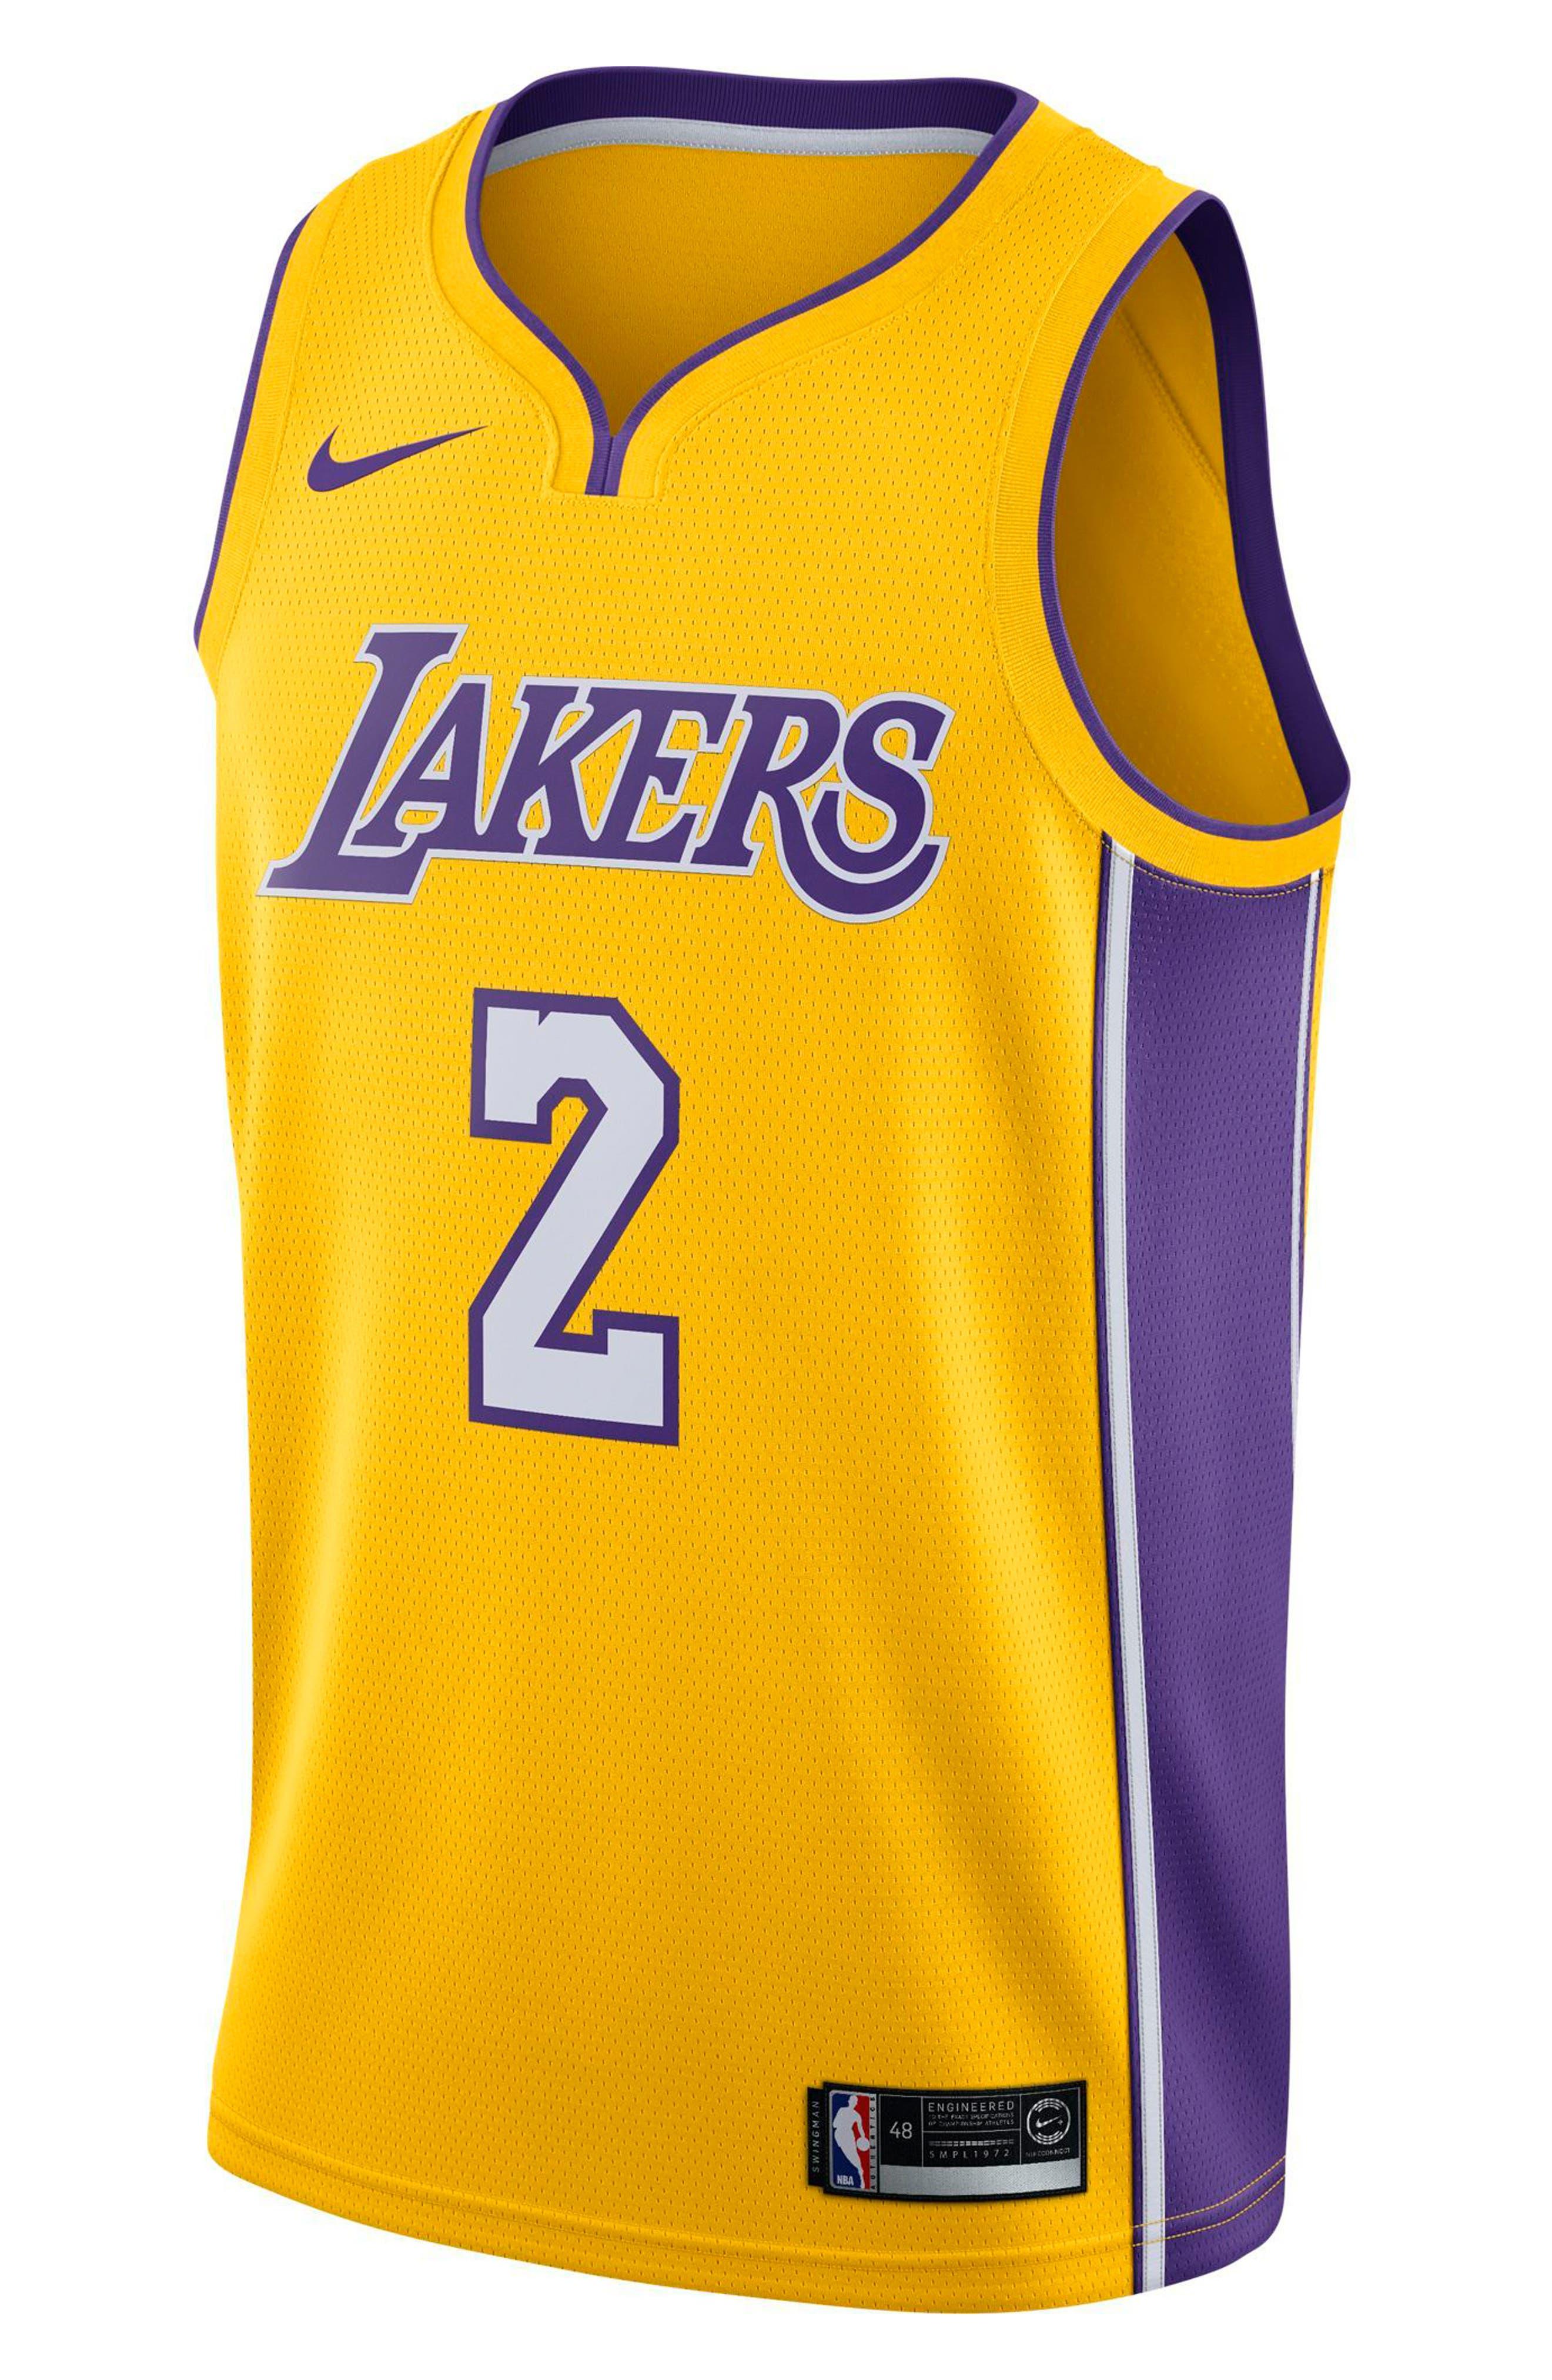 Los Angeles Lakers Nike Association Edition Swingman Men's NBA Jersey,                         Main,                         color, 736